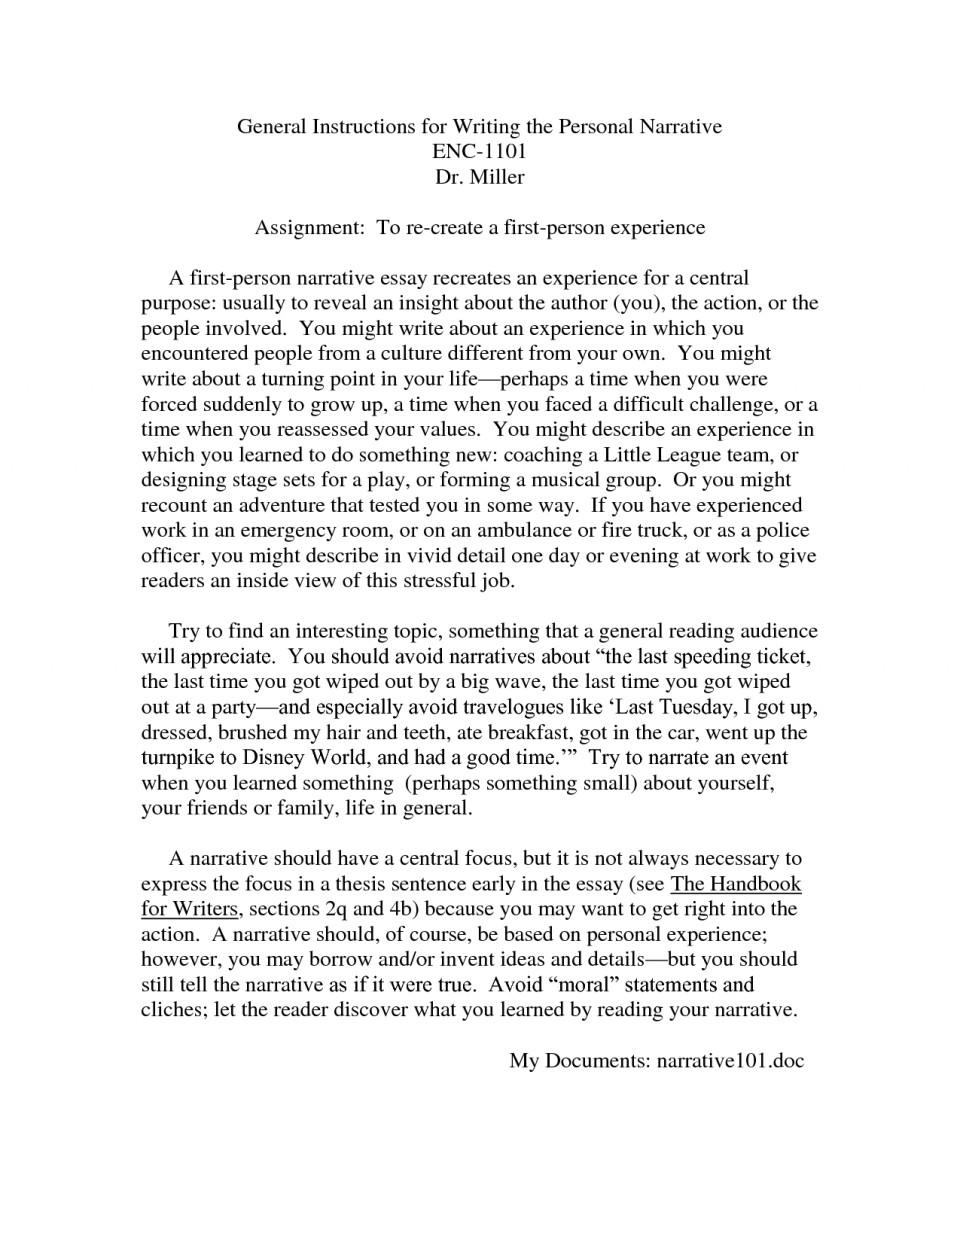 Msc thesis latex format